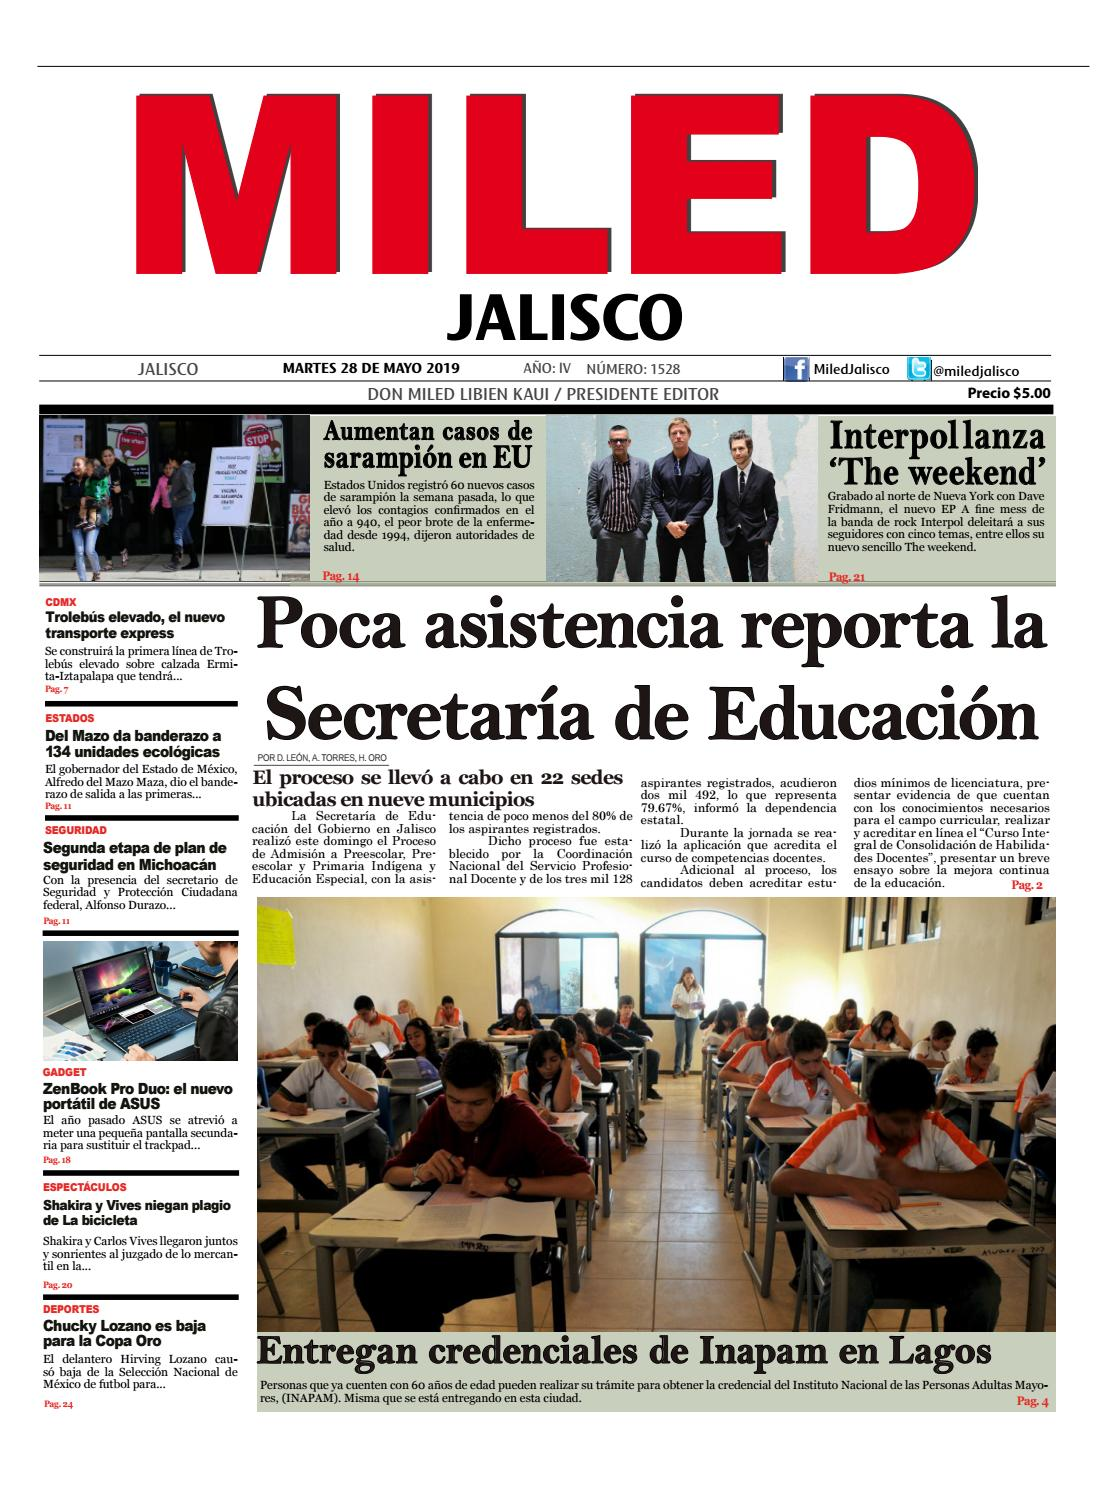 Miled Jalisco 28 05 19 By Miled Estados Issuu